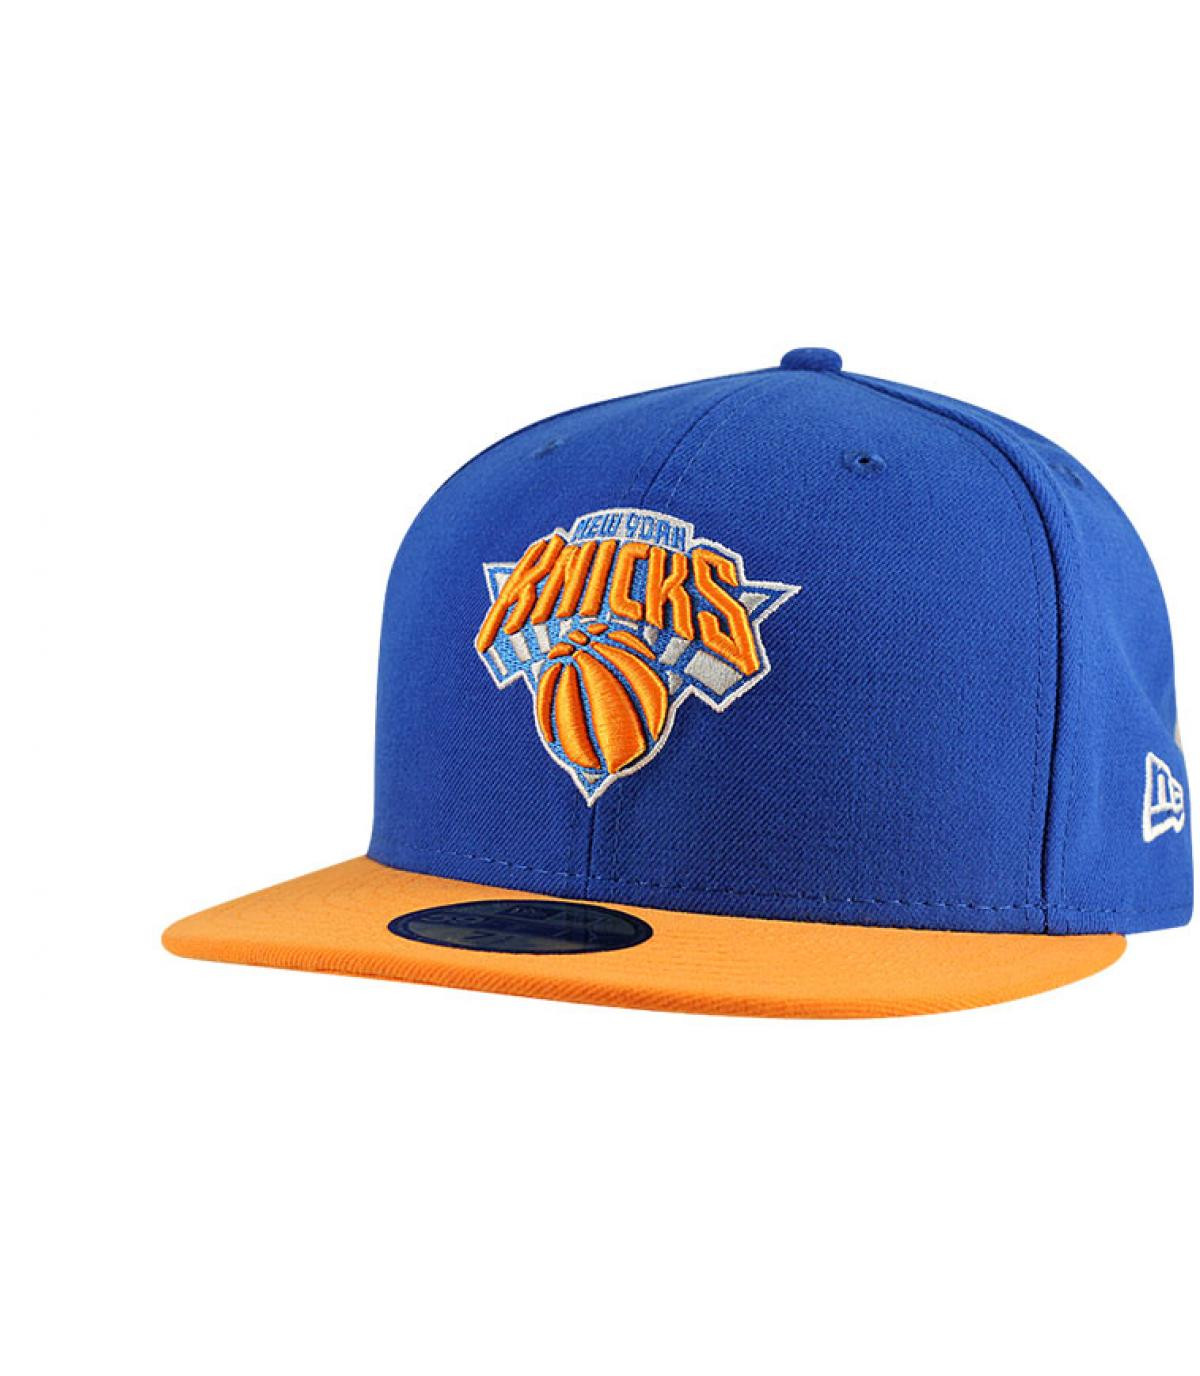 Blue Knicks cap